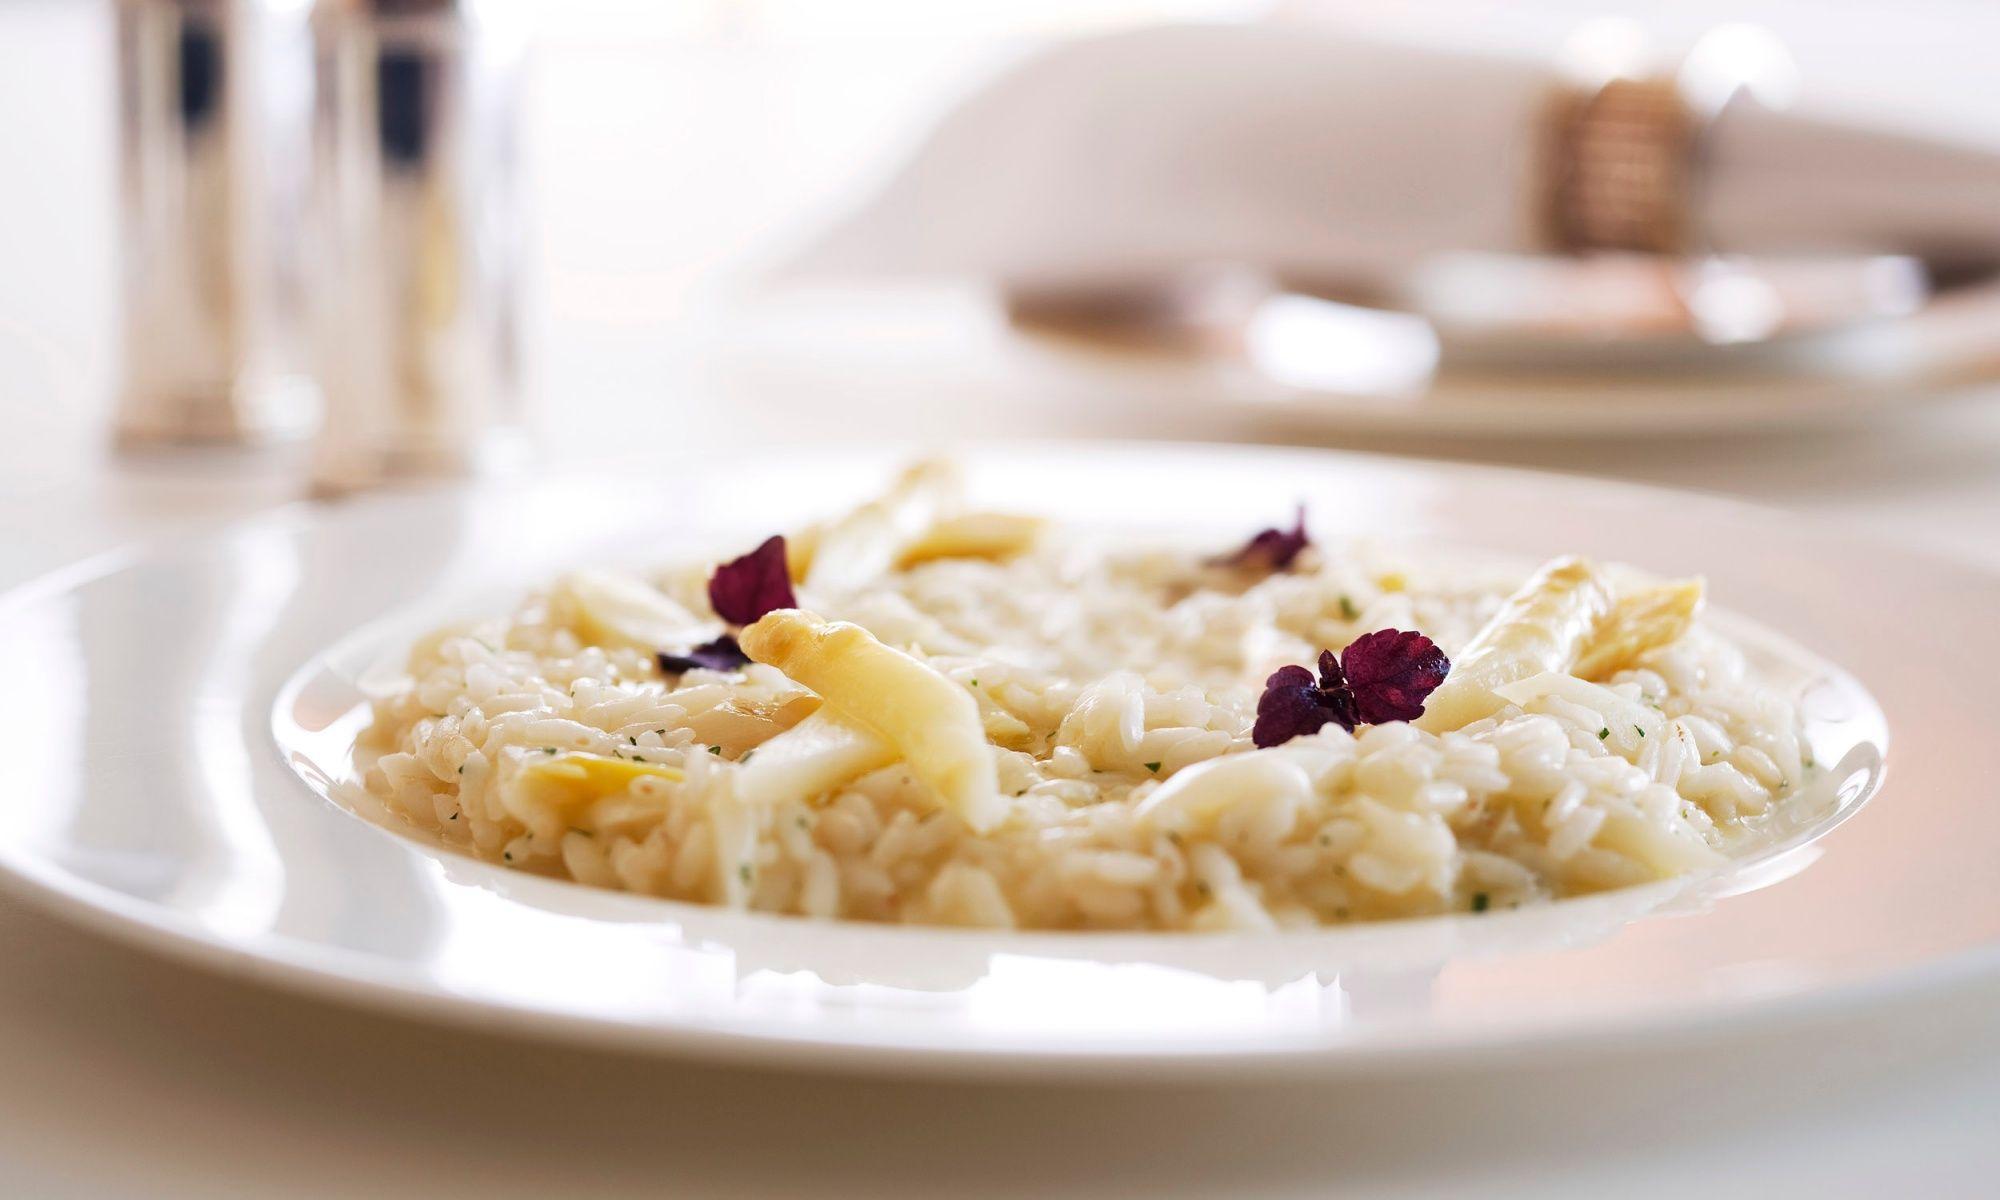 Nicholini's Presents The Season's Best White Asparagus